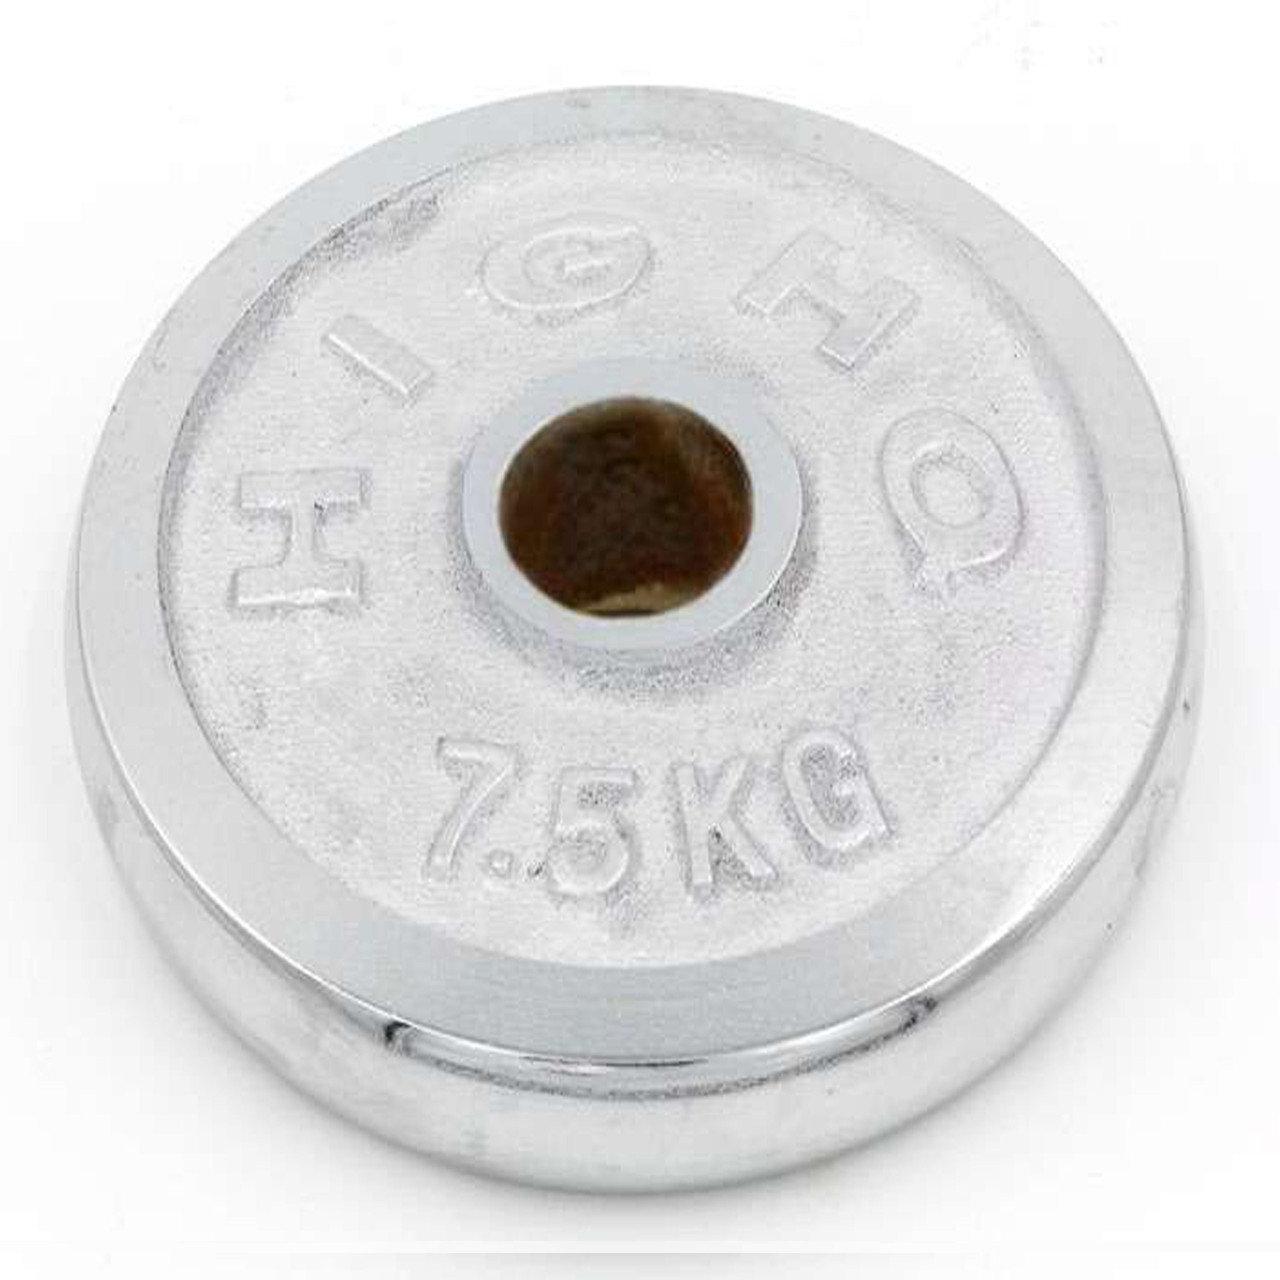 Блин хромированный олимпийский 7,5 кг (52 мм)